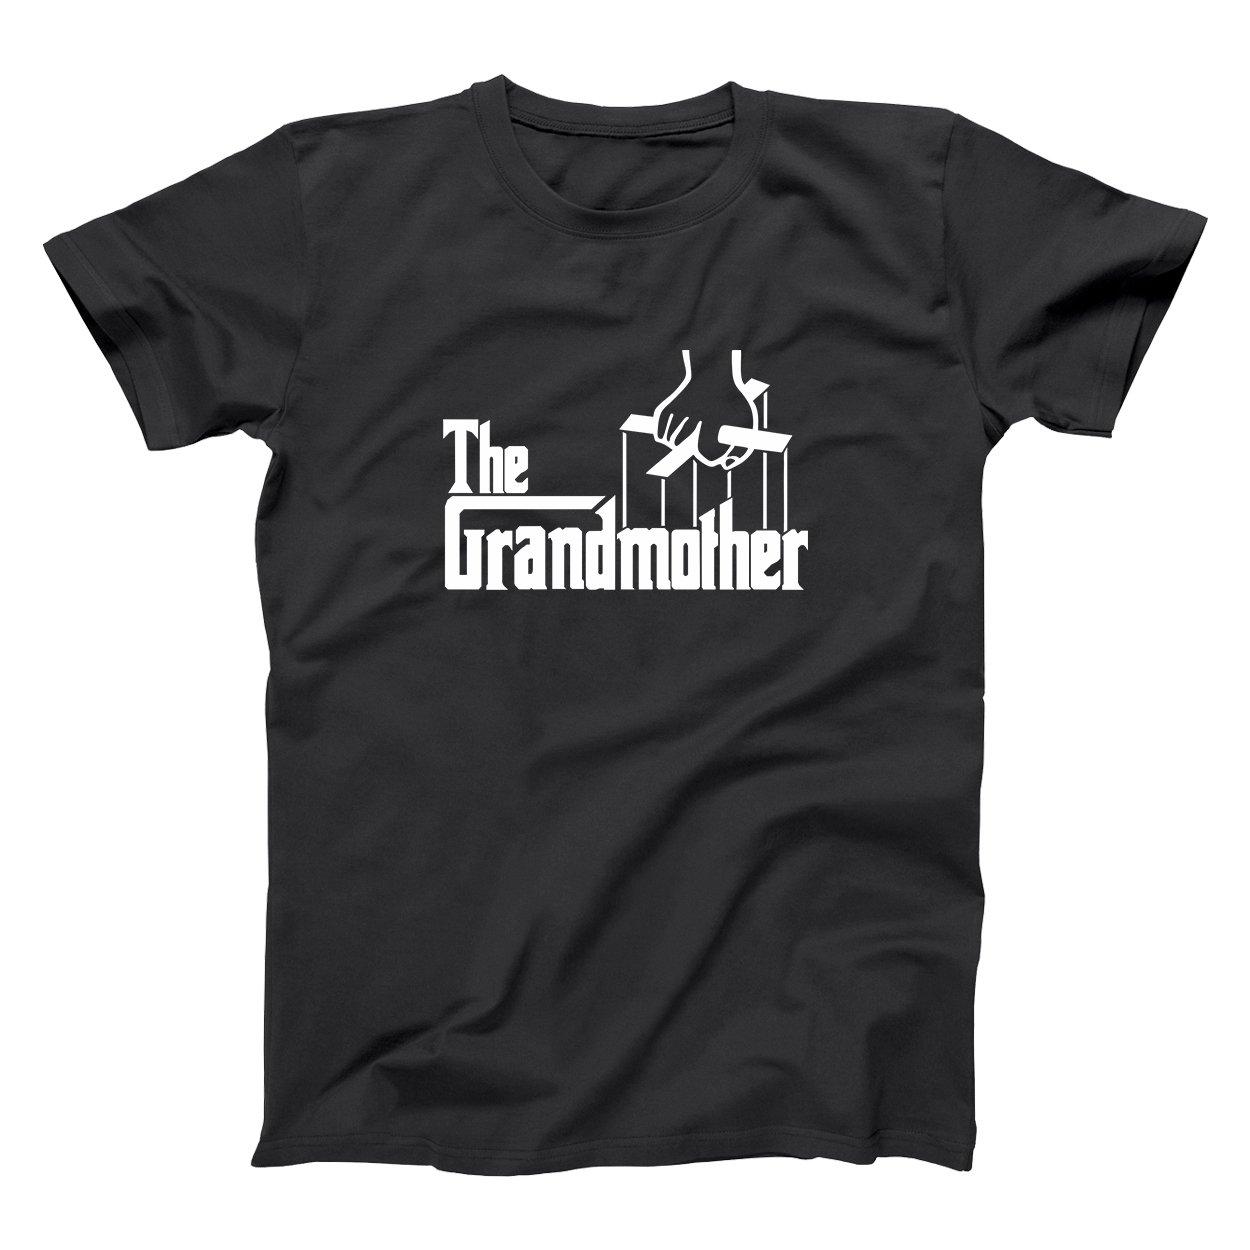 The Grandmother Italian Mob S Shirt Xxxxxx Black Apparel